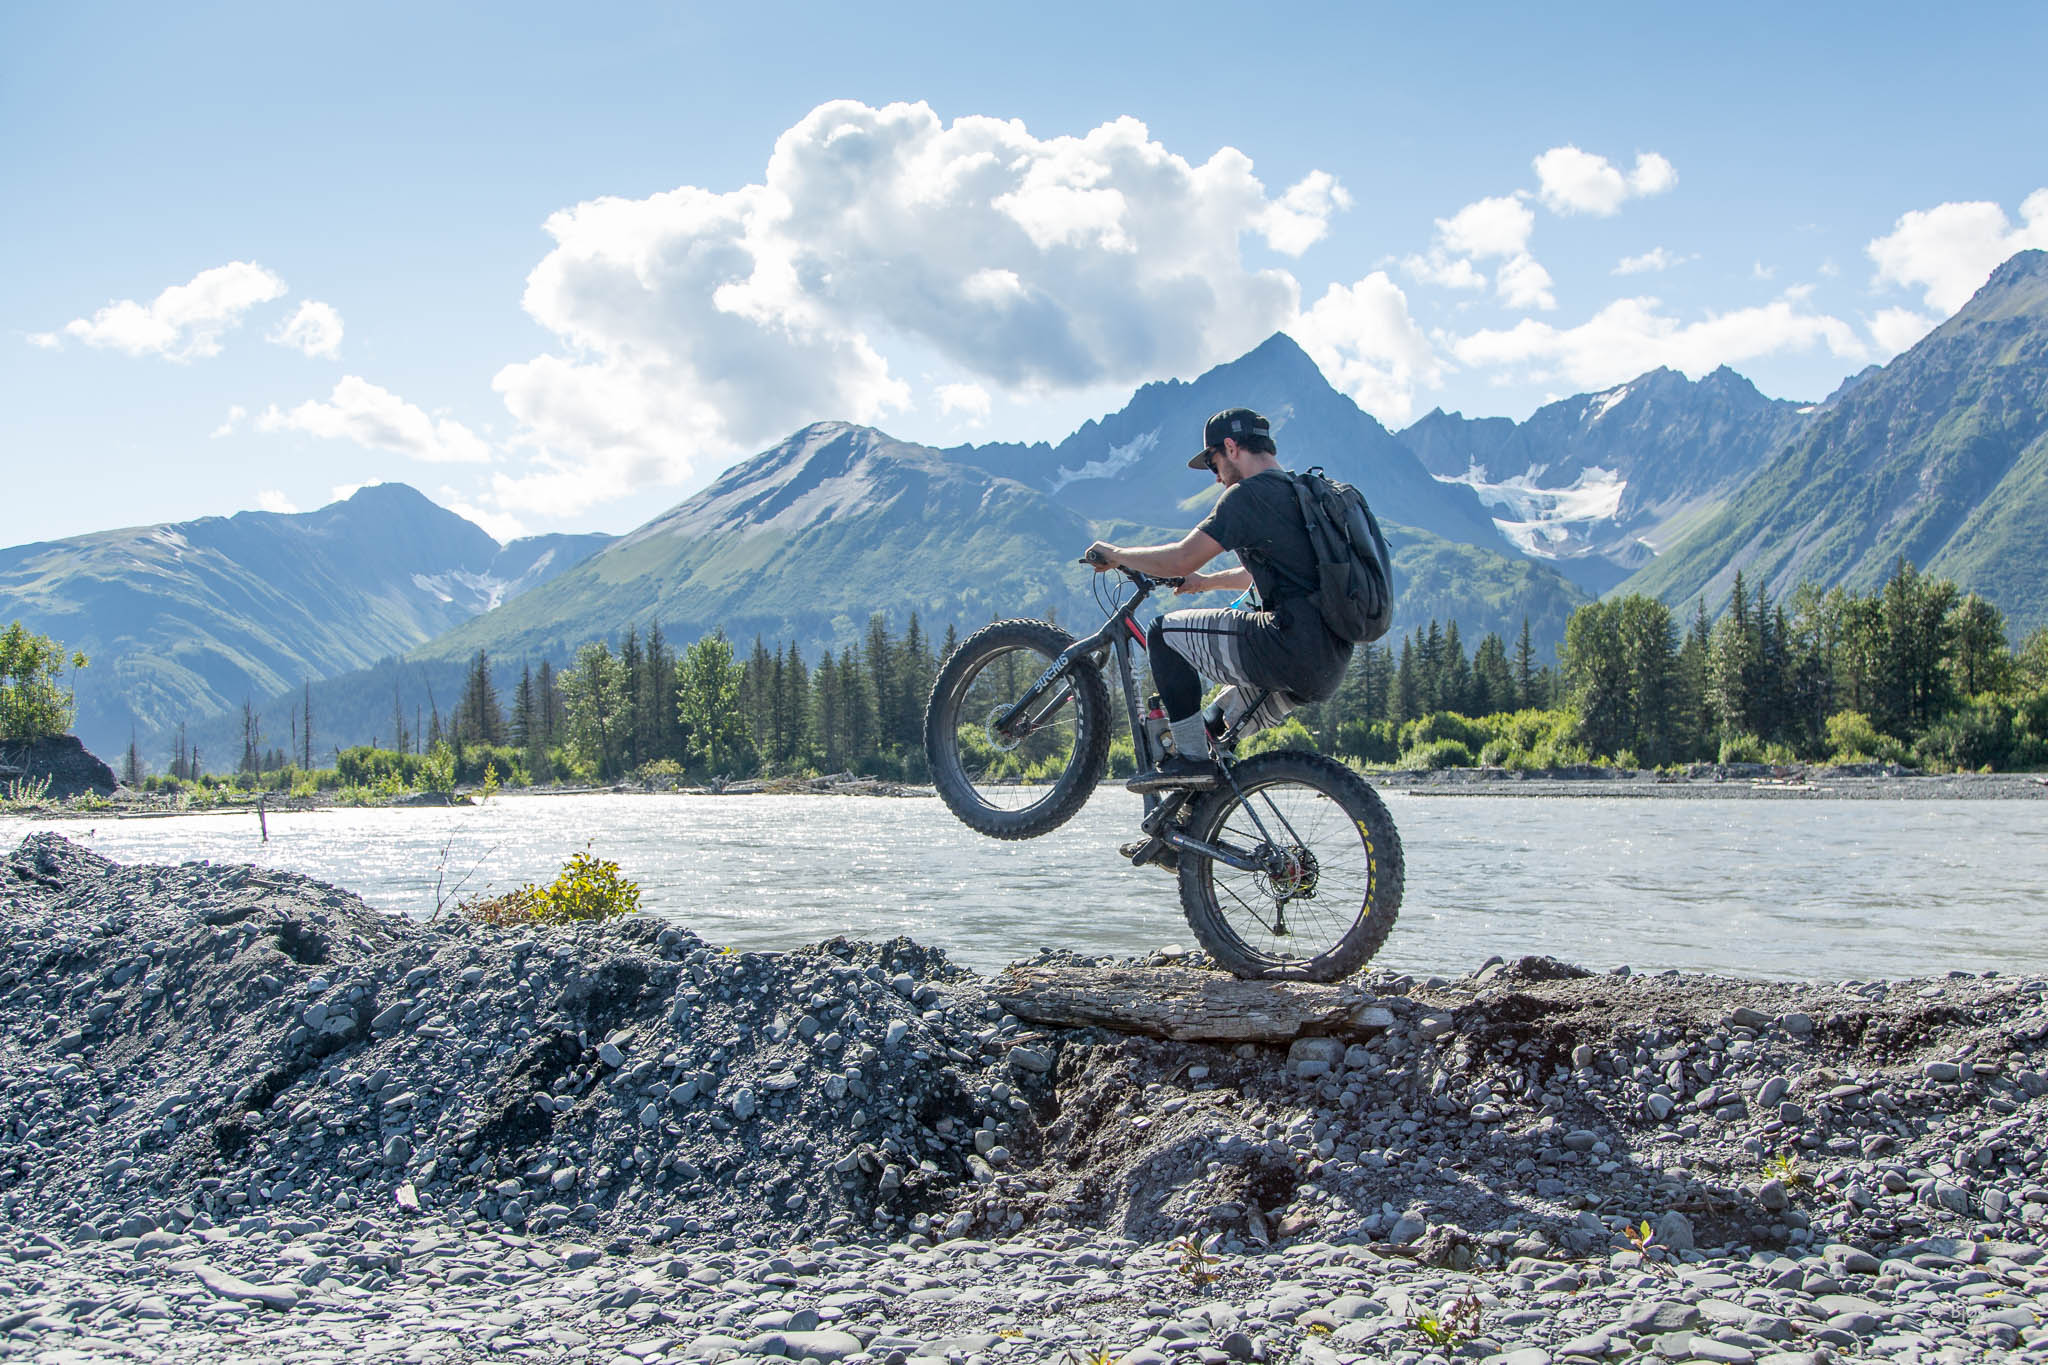 Noah rides a wheelie near Resurrection River - Seward, Alaska.